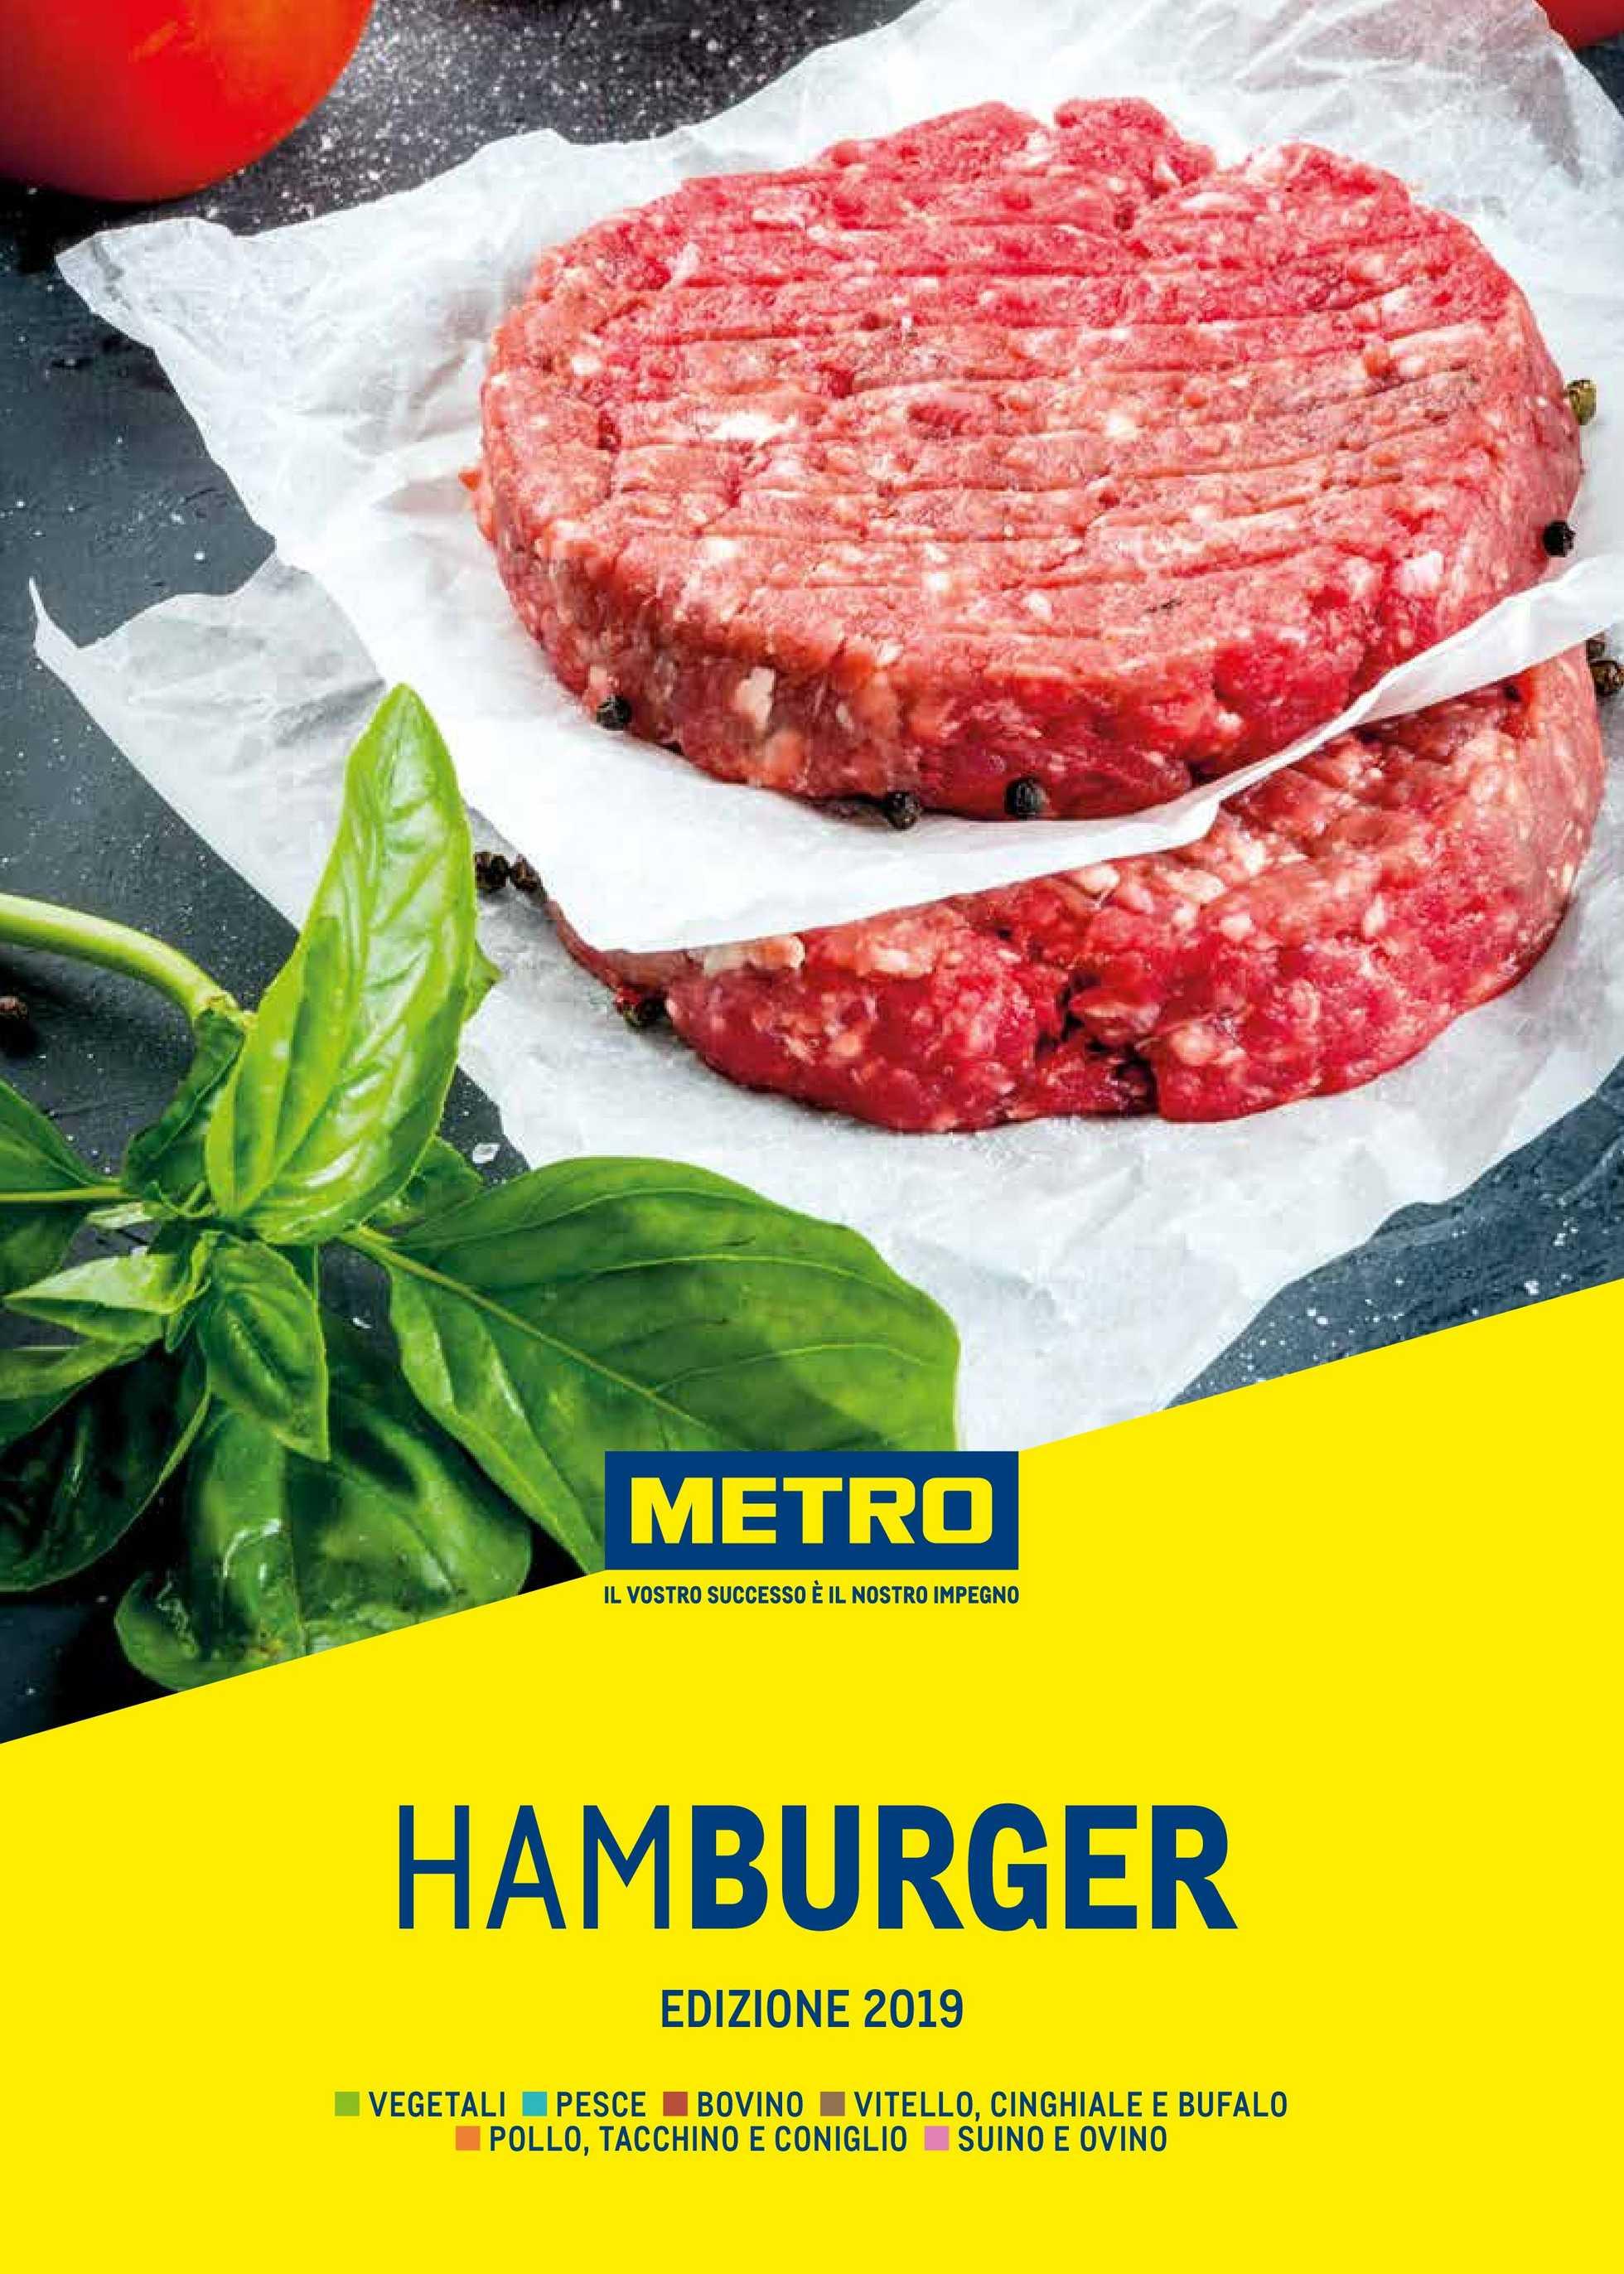 Metro - offerte valide dal 01.01.2019 al 31.12.2019 - pagina 1.